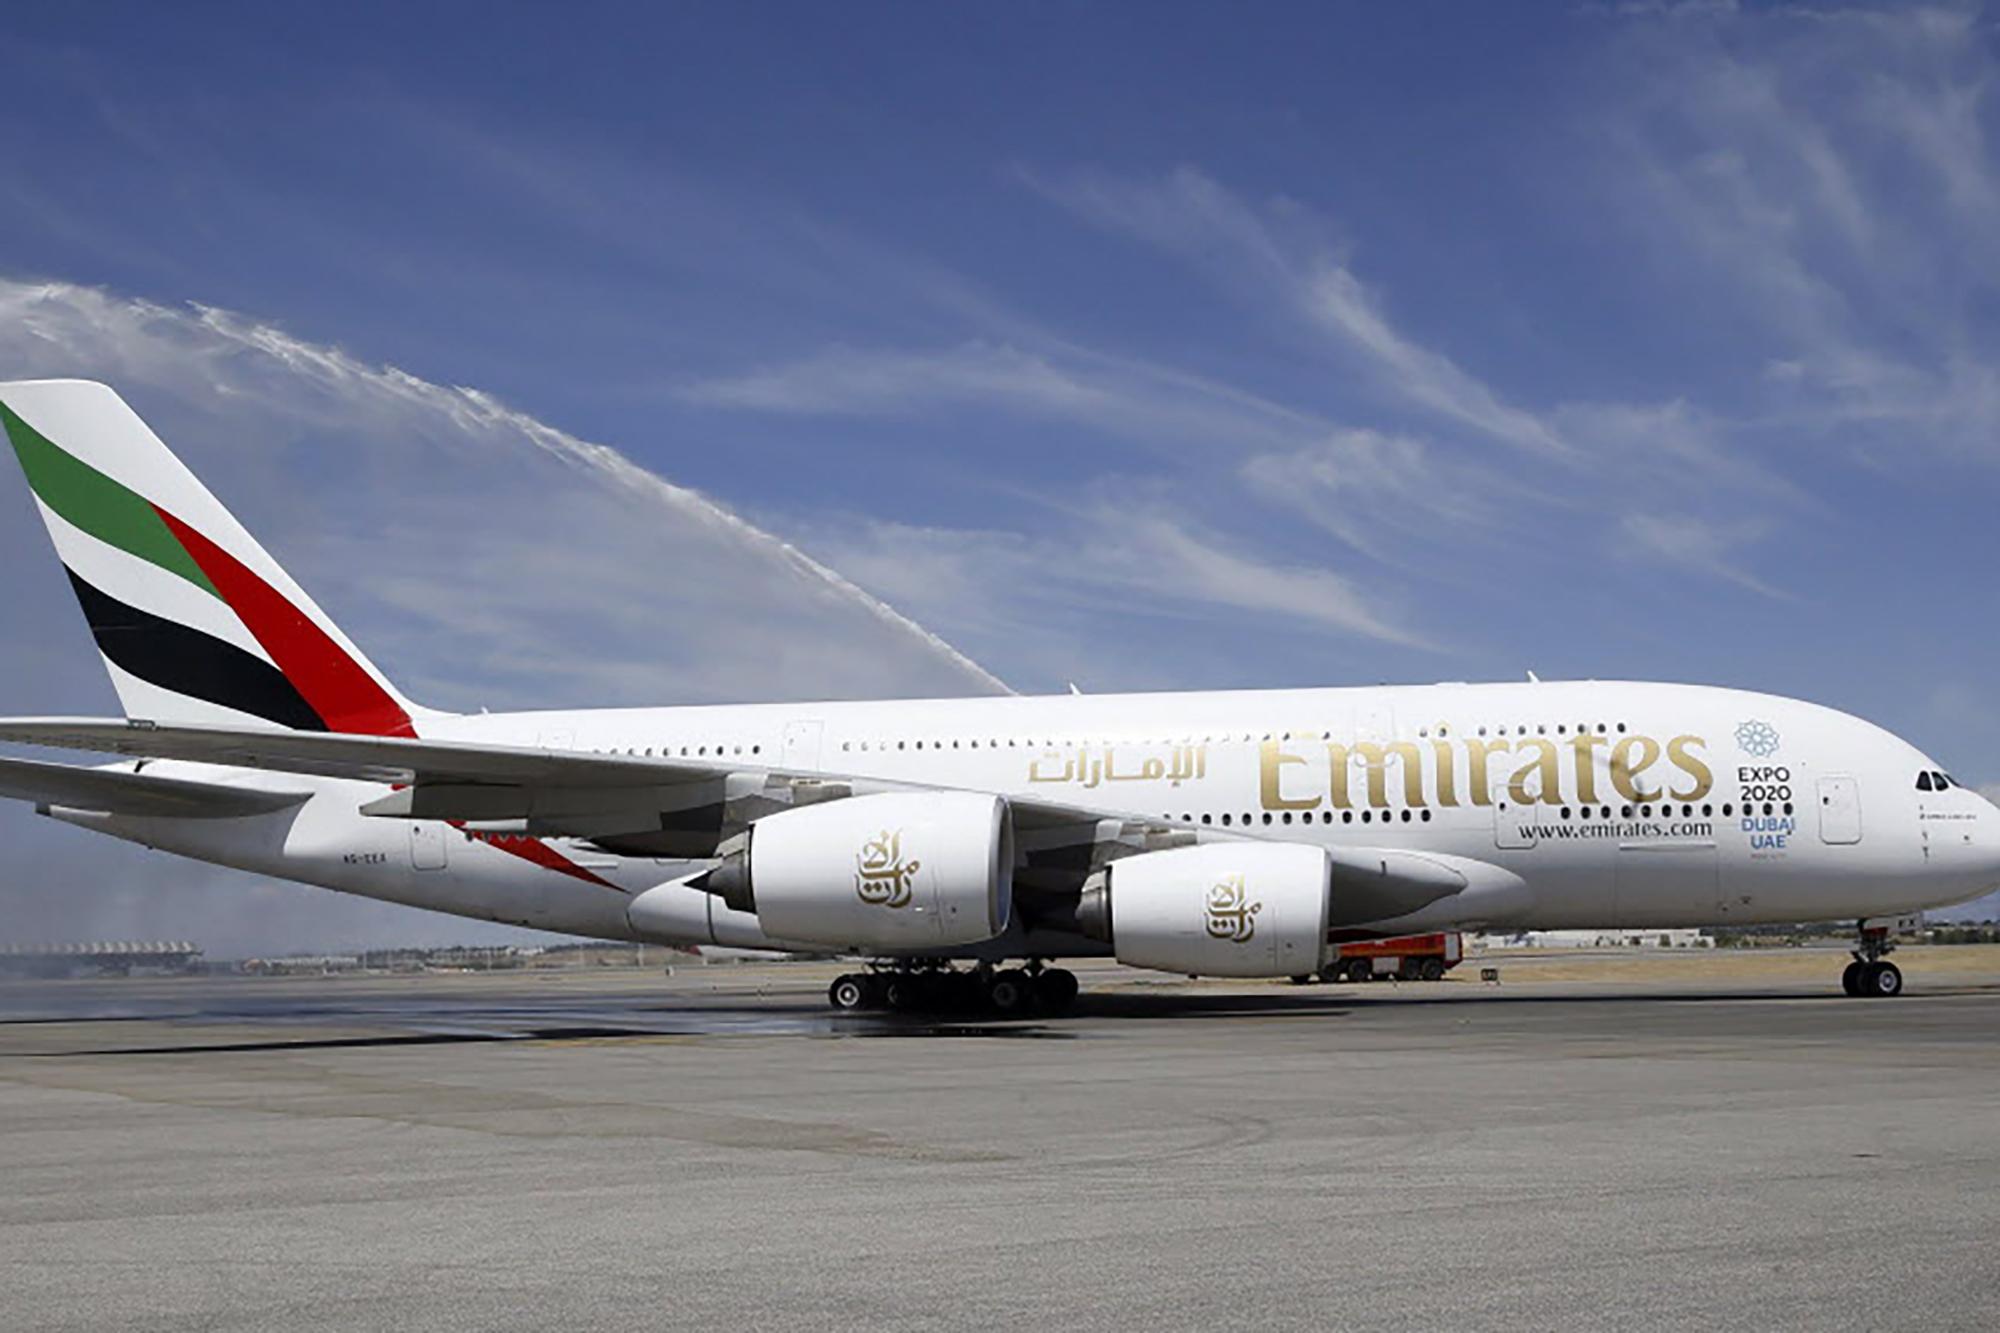 Emirates Airlines Reschedule Flight